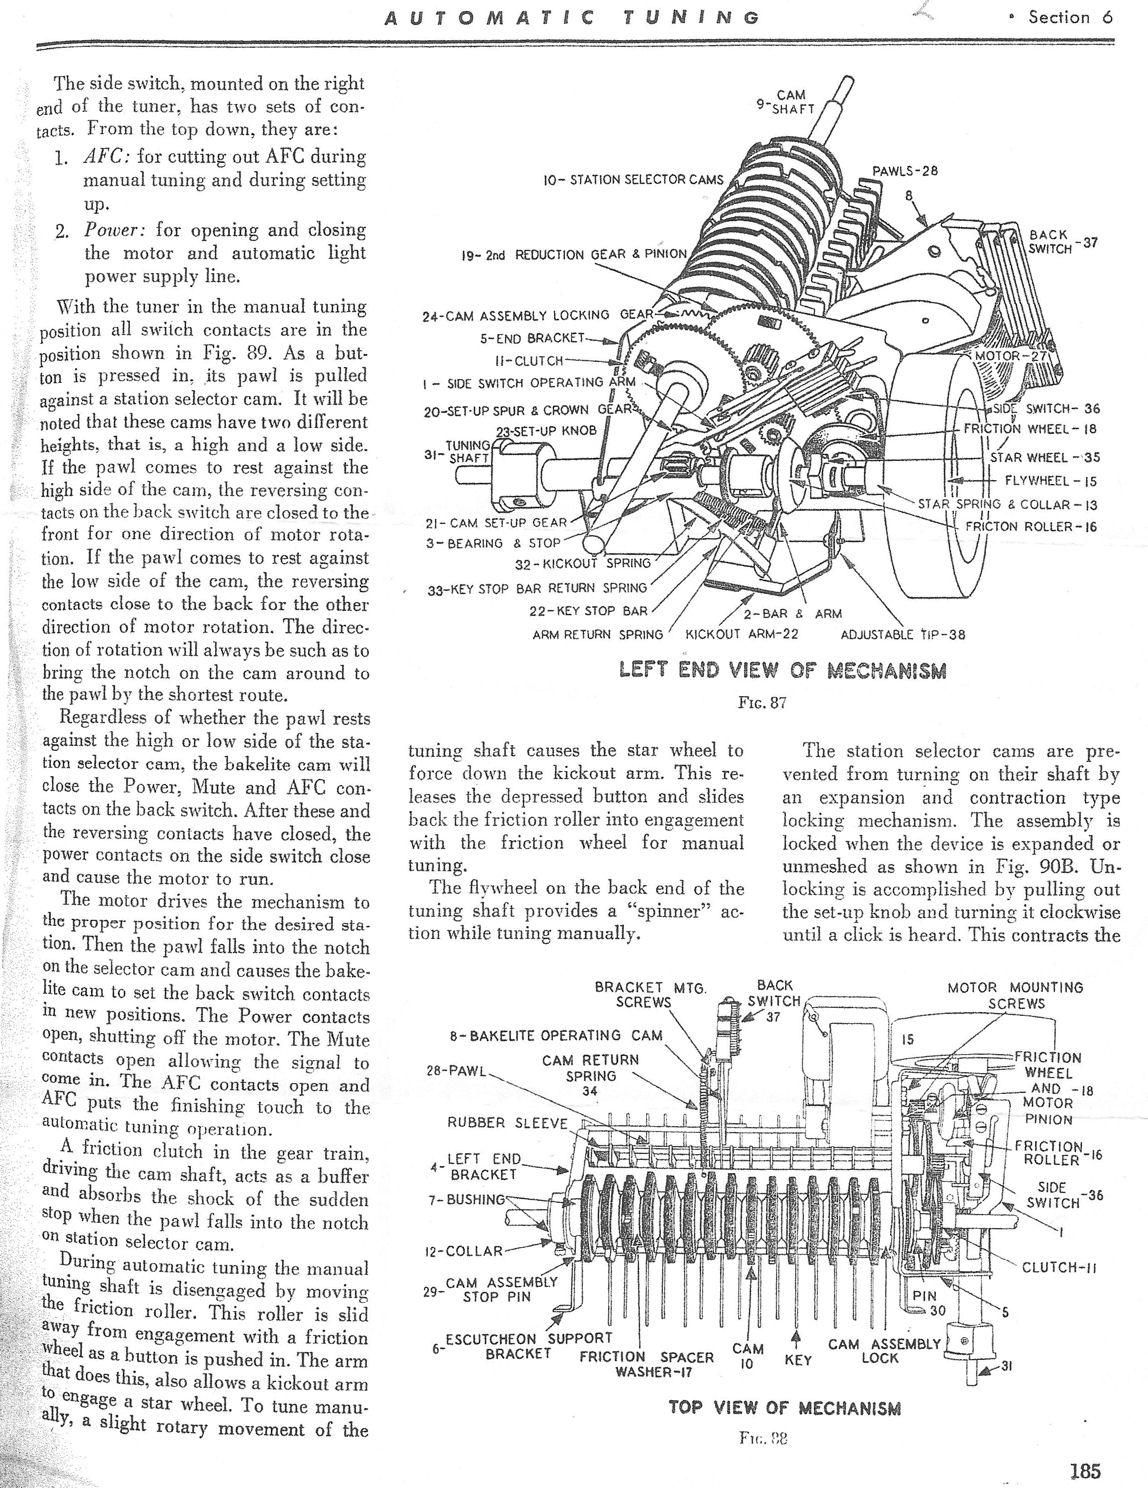 Stewart Warner Model 1865 Console Radio (1938)